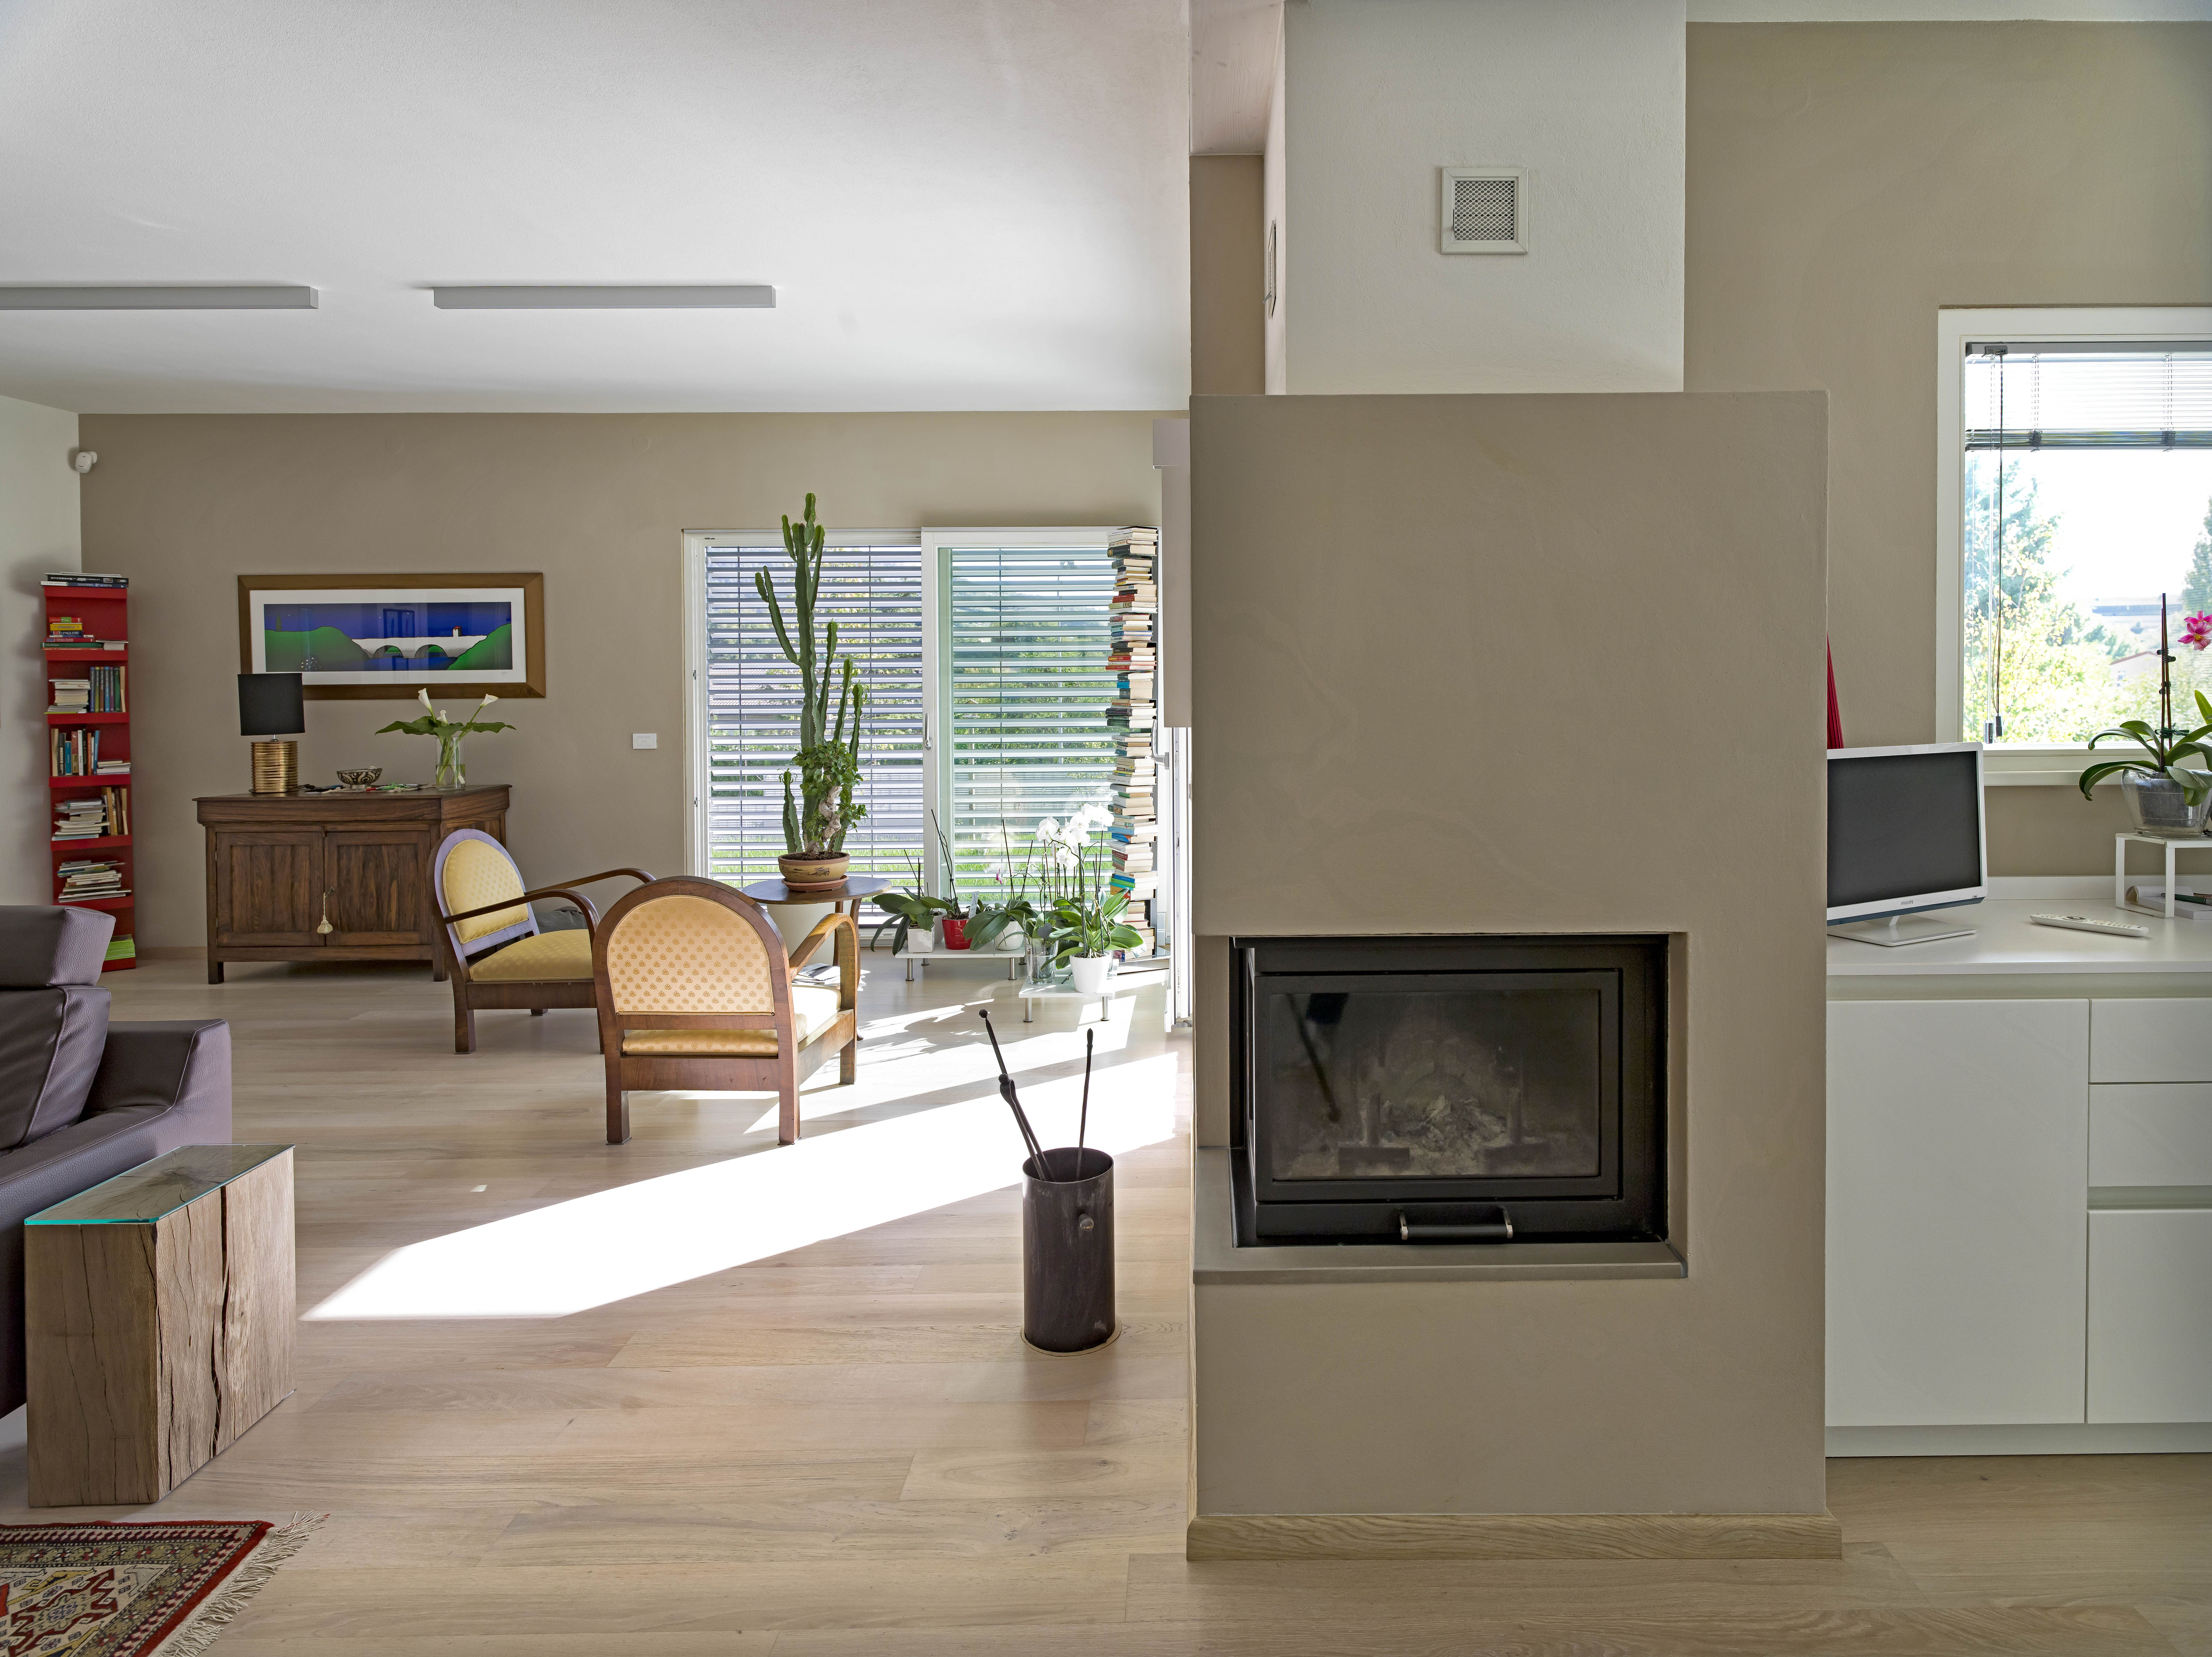 Design in legno Rubner Haus | Casa Rubner 109 | Pinterest